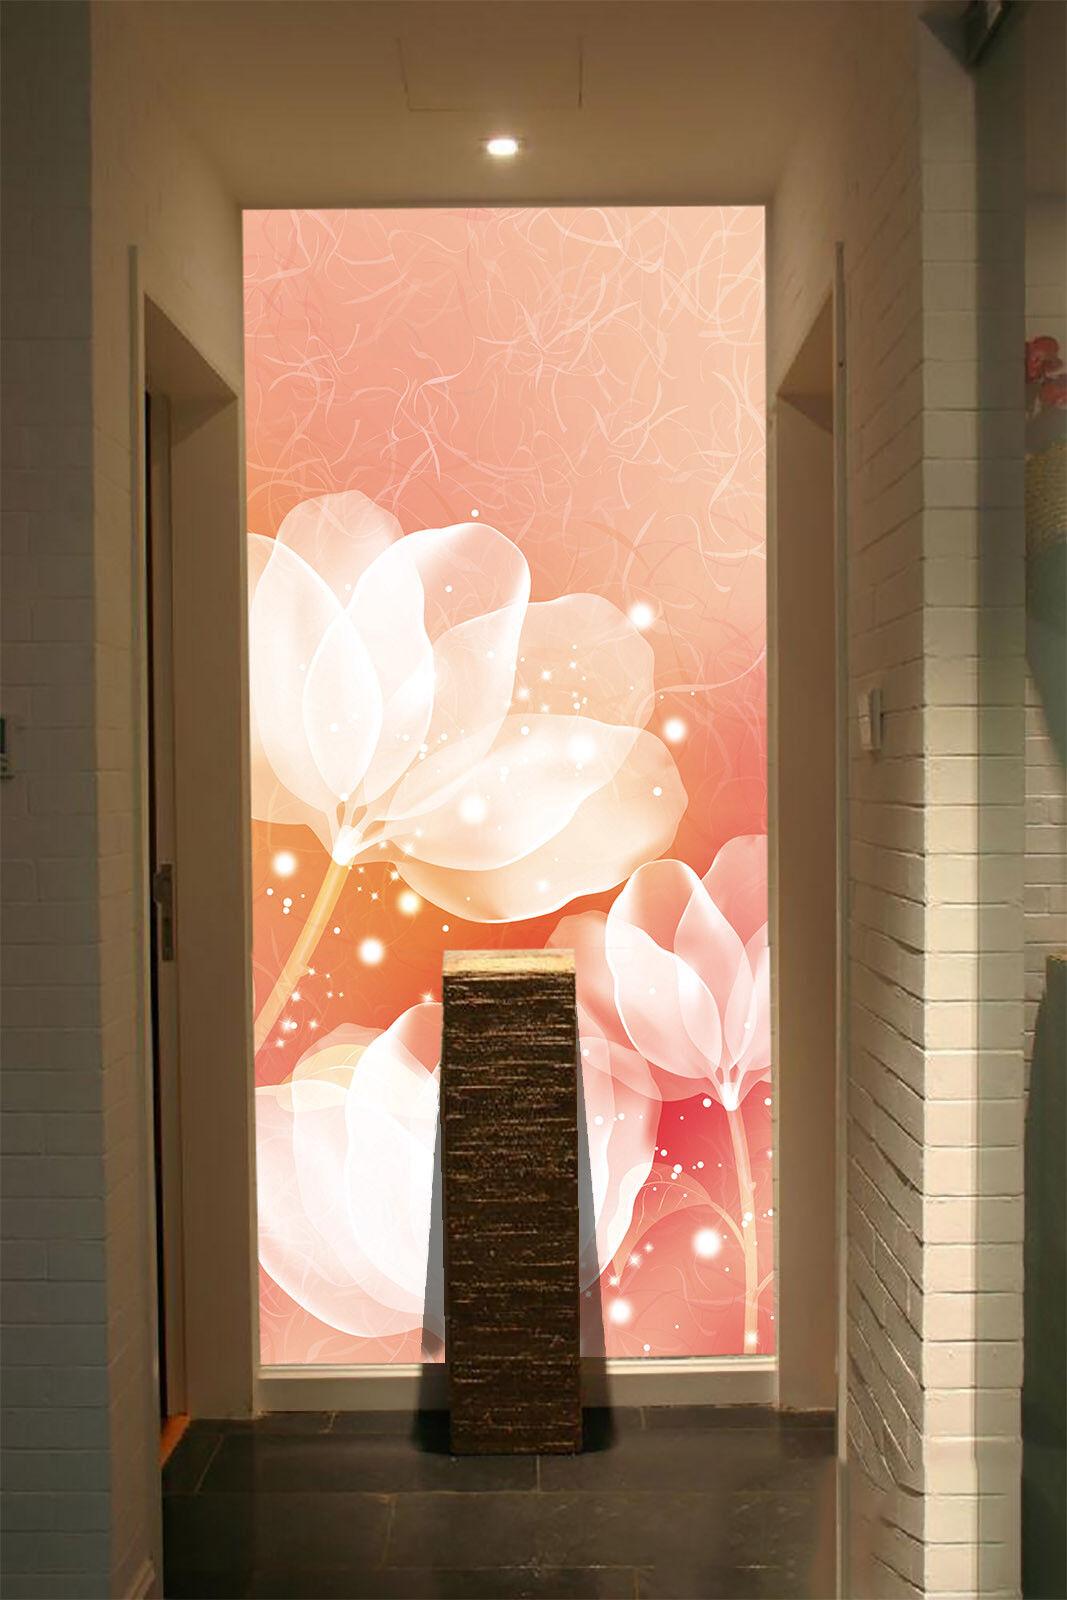 3D Anime Petal 4173 Wallpaper Murals Wall Print Wall Mural AJ WALLPAPER UK Carly